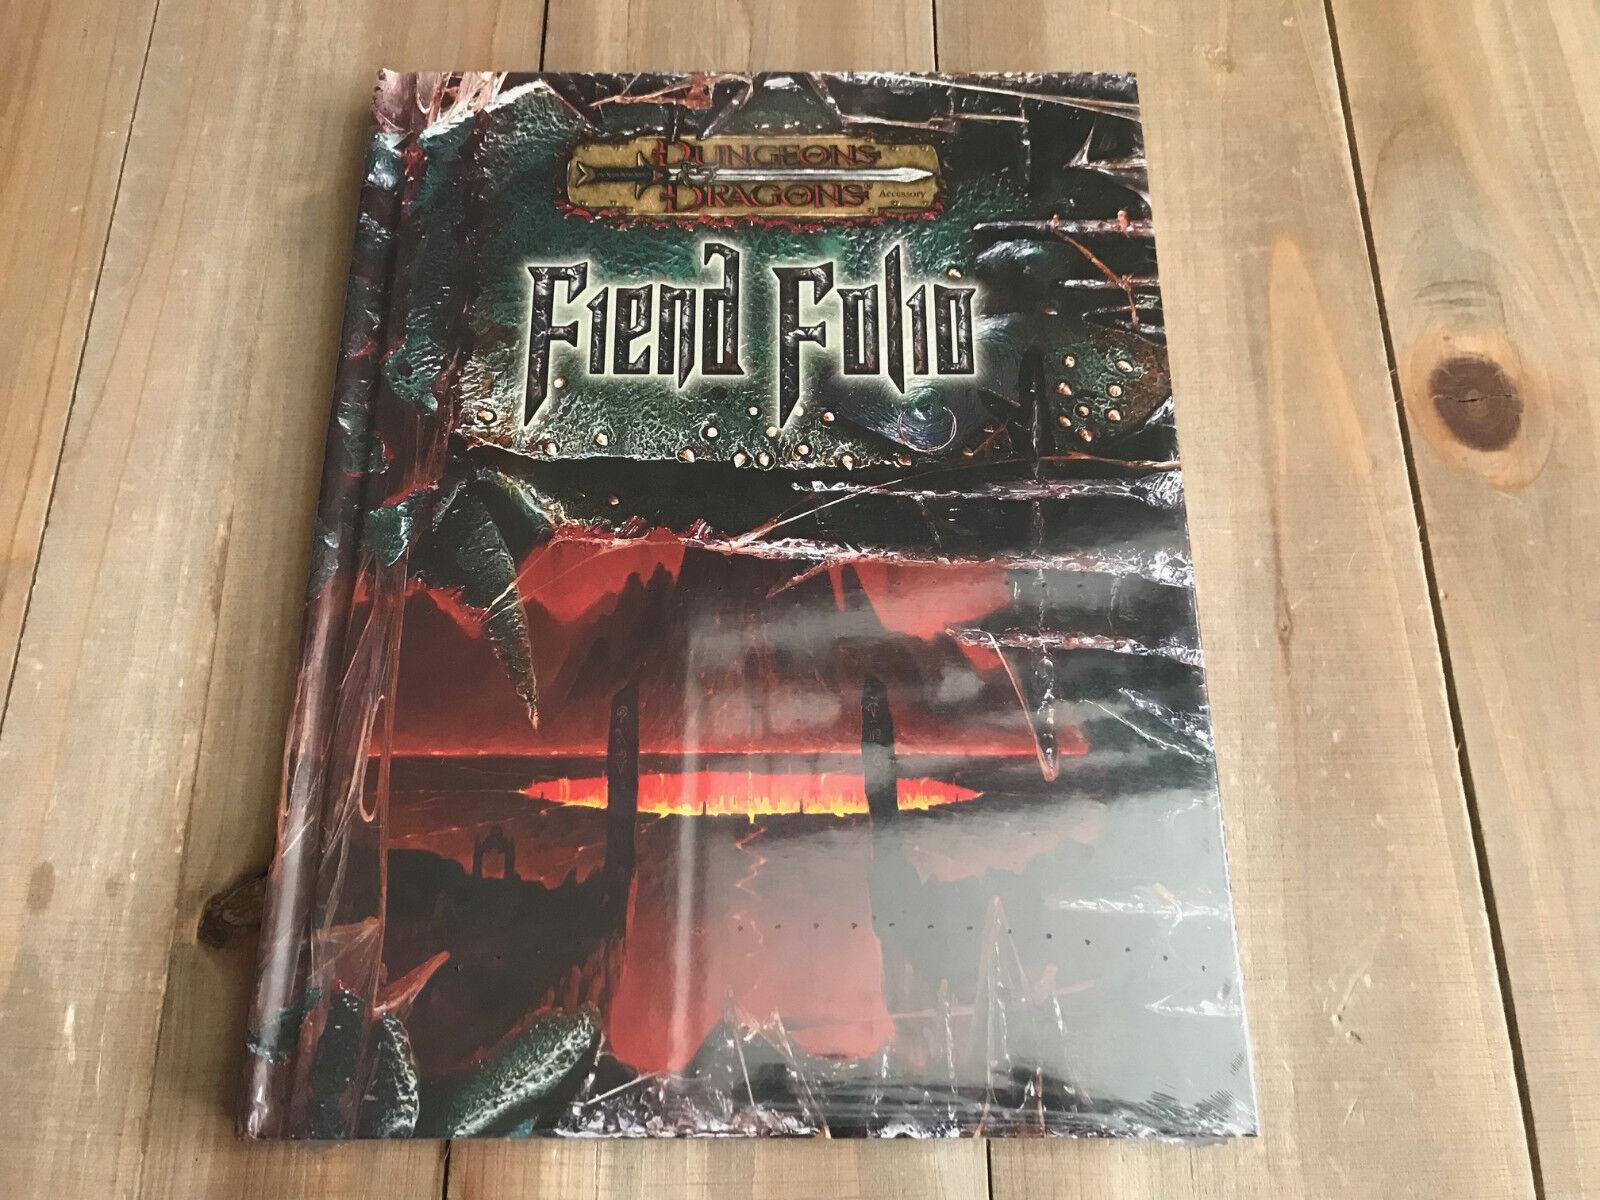 Donjons &  Dragons - D20 - Fiend Folio - Jeu Rôle - Wizards Of The Coast - RPG  édition limitée